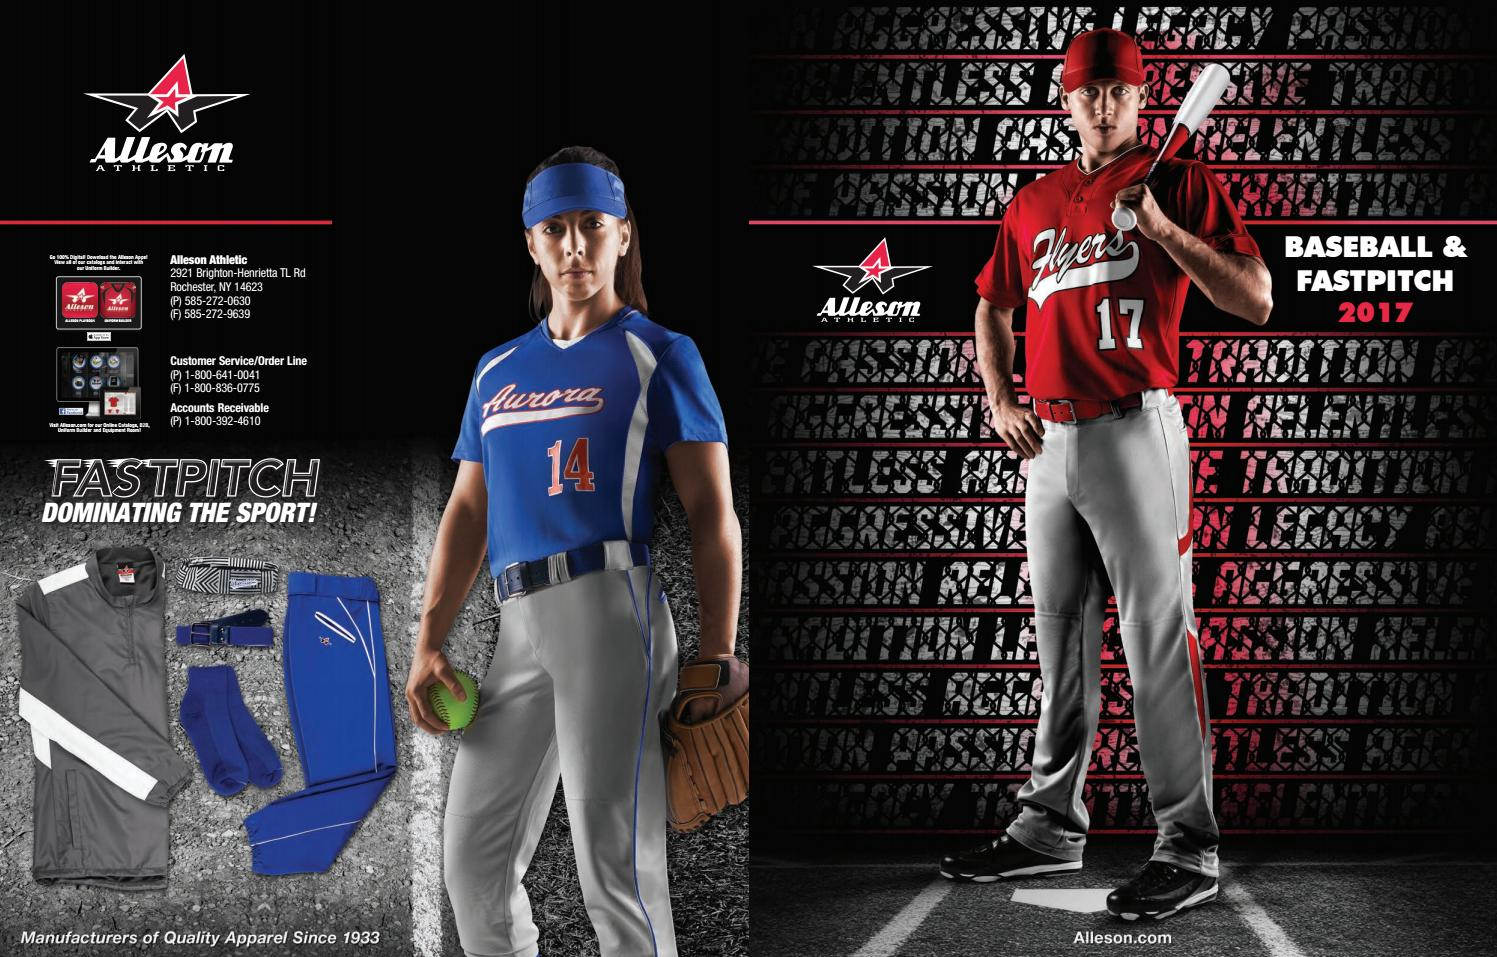 9dd23a47f Alleson Athletic Baseball and Softball Fastpitch Catalog 2017 by LTS -  Legacy Team Sales - issuu